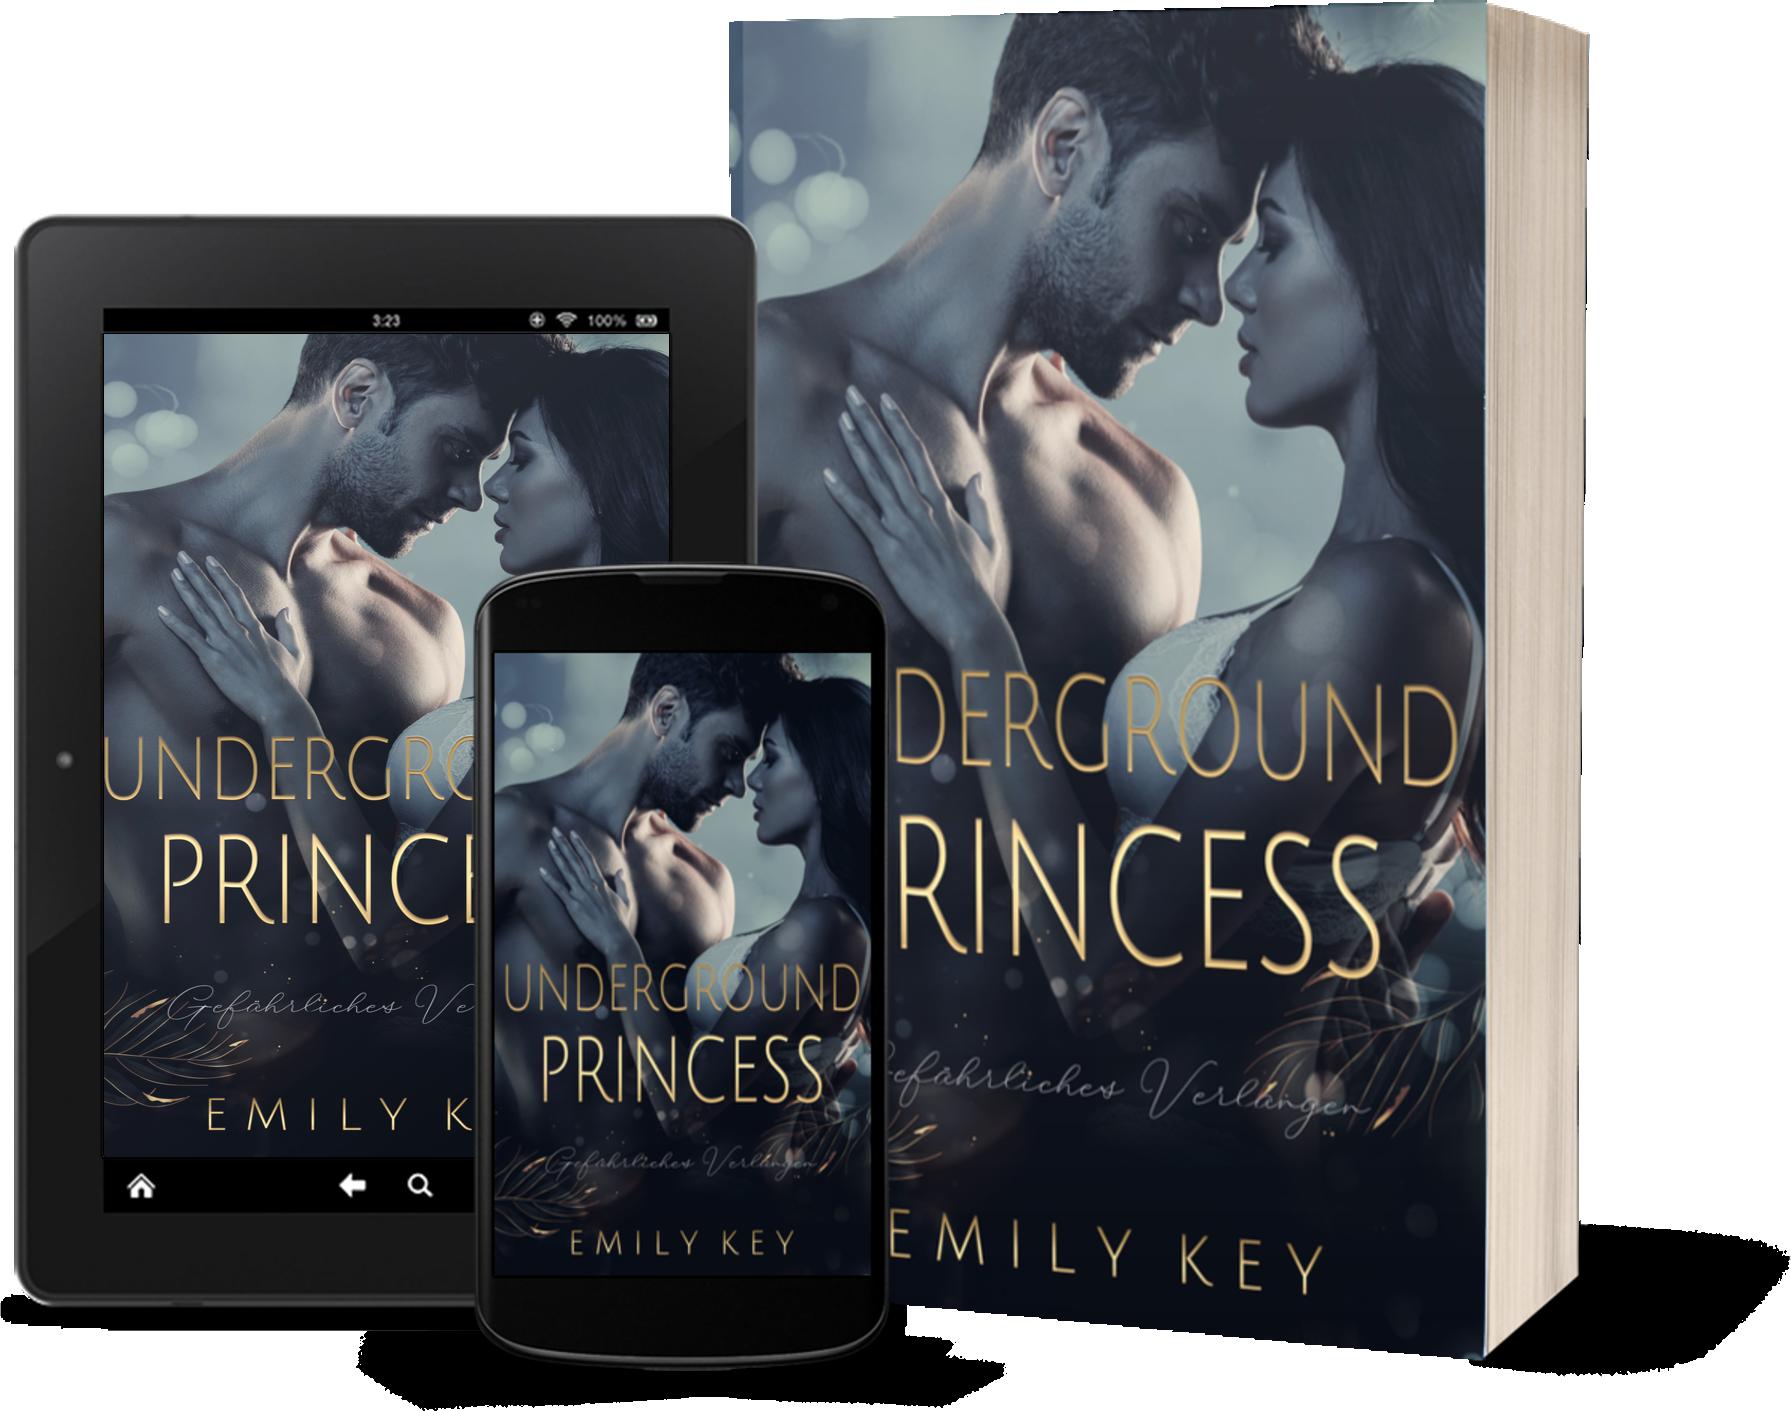 Underground Princess 1 - Emily Key